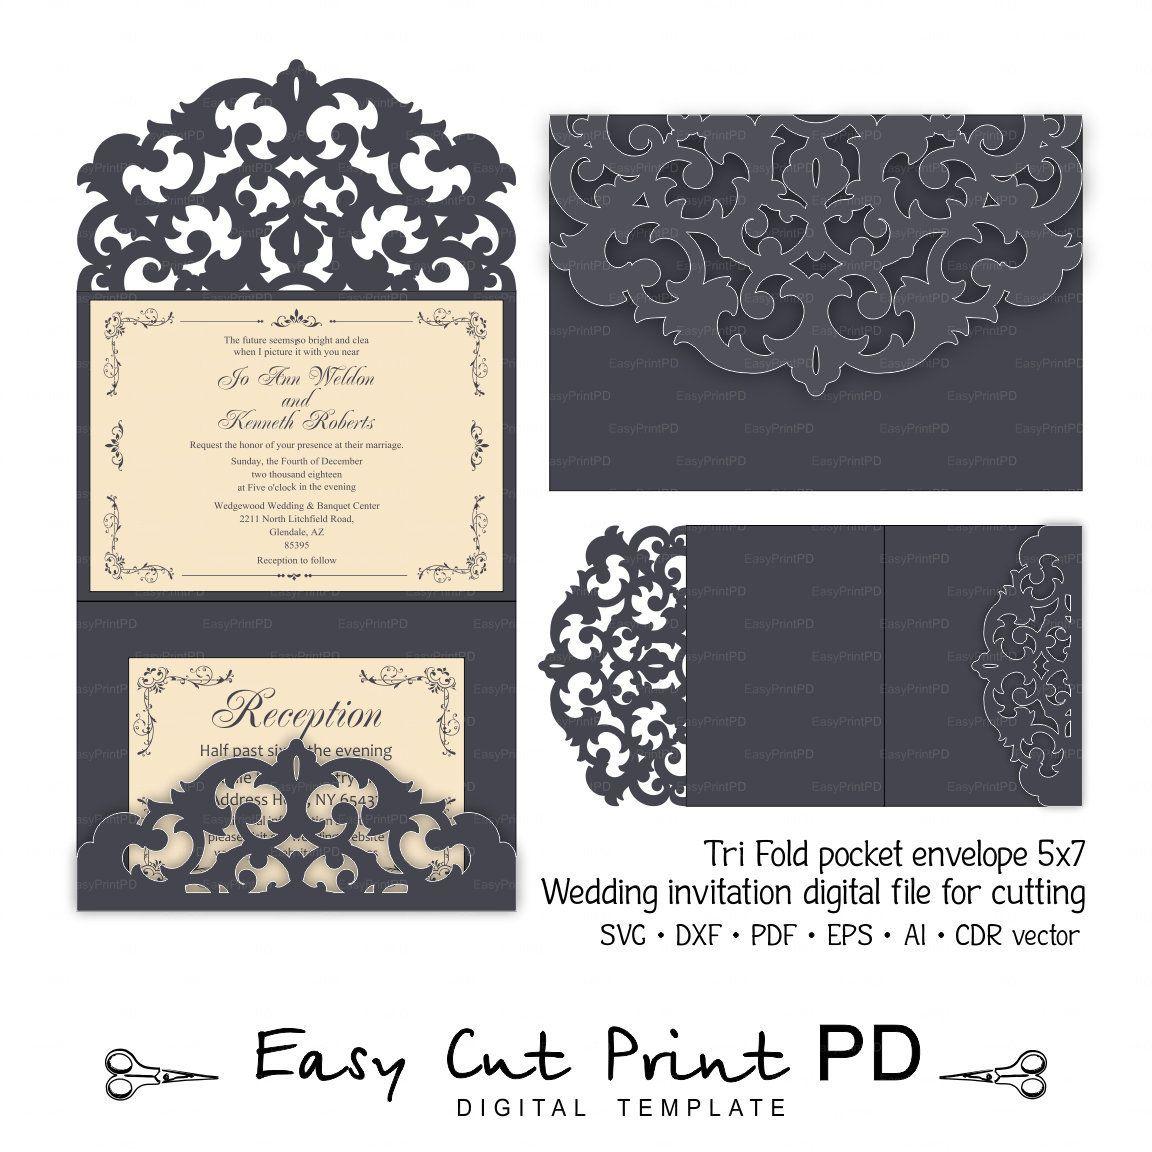 Tri Fold Pocket Envelope 5x7 Invitation Wedding Card Template Etsy Cricut Invitations Cricut Wedding Invitations Wedding Card Templates